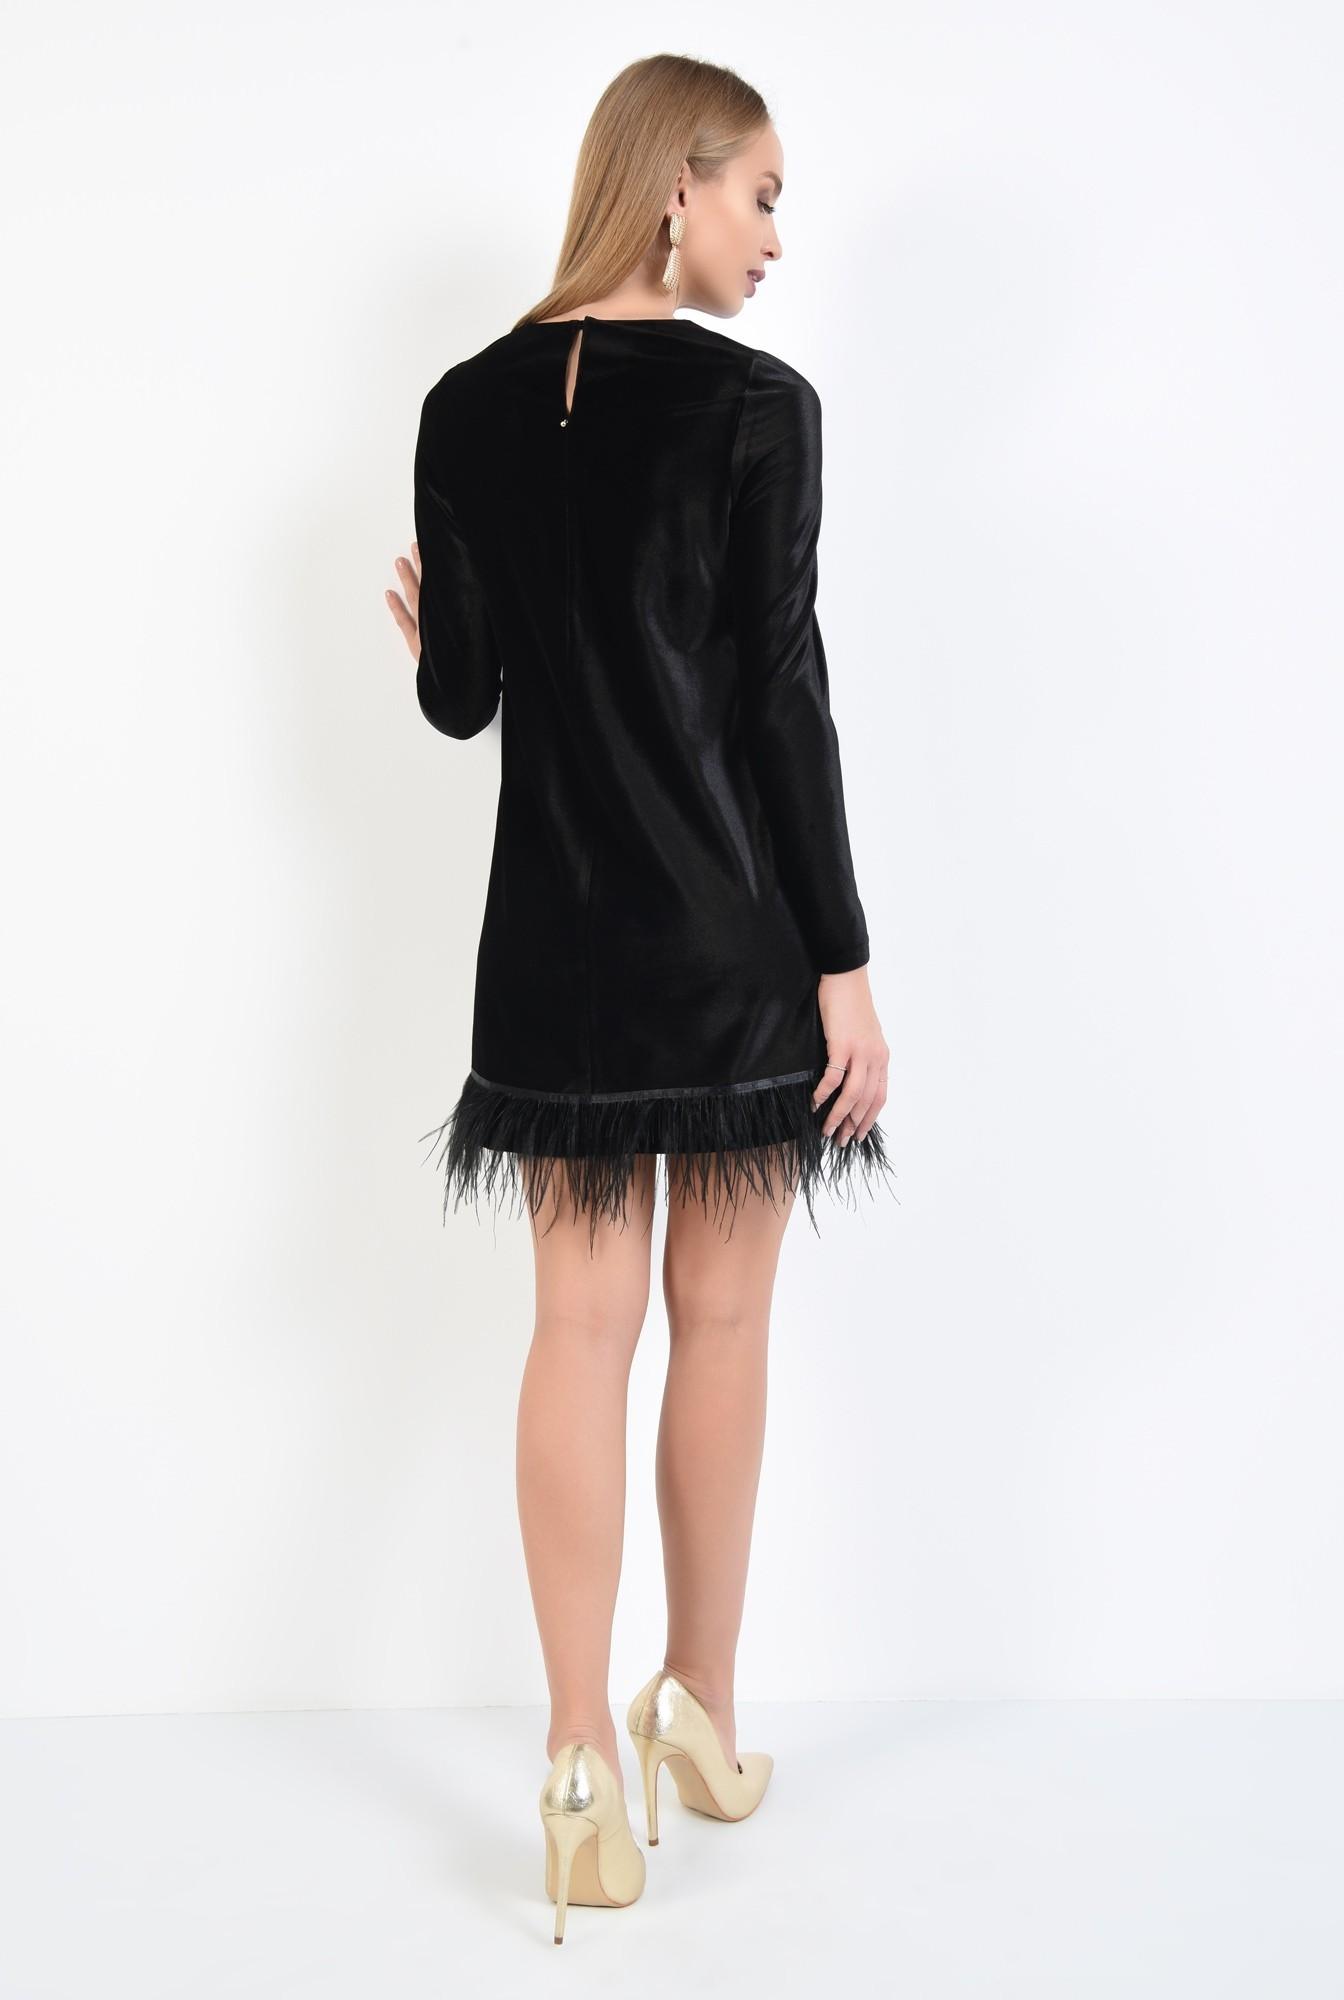 1 - rochie de seara, neagra, scurta, croi drept lejer, bordura din pene